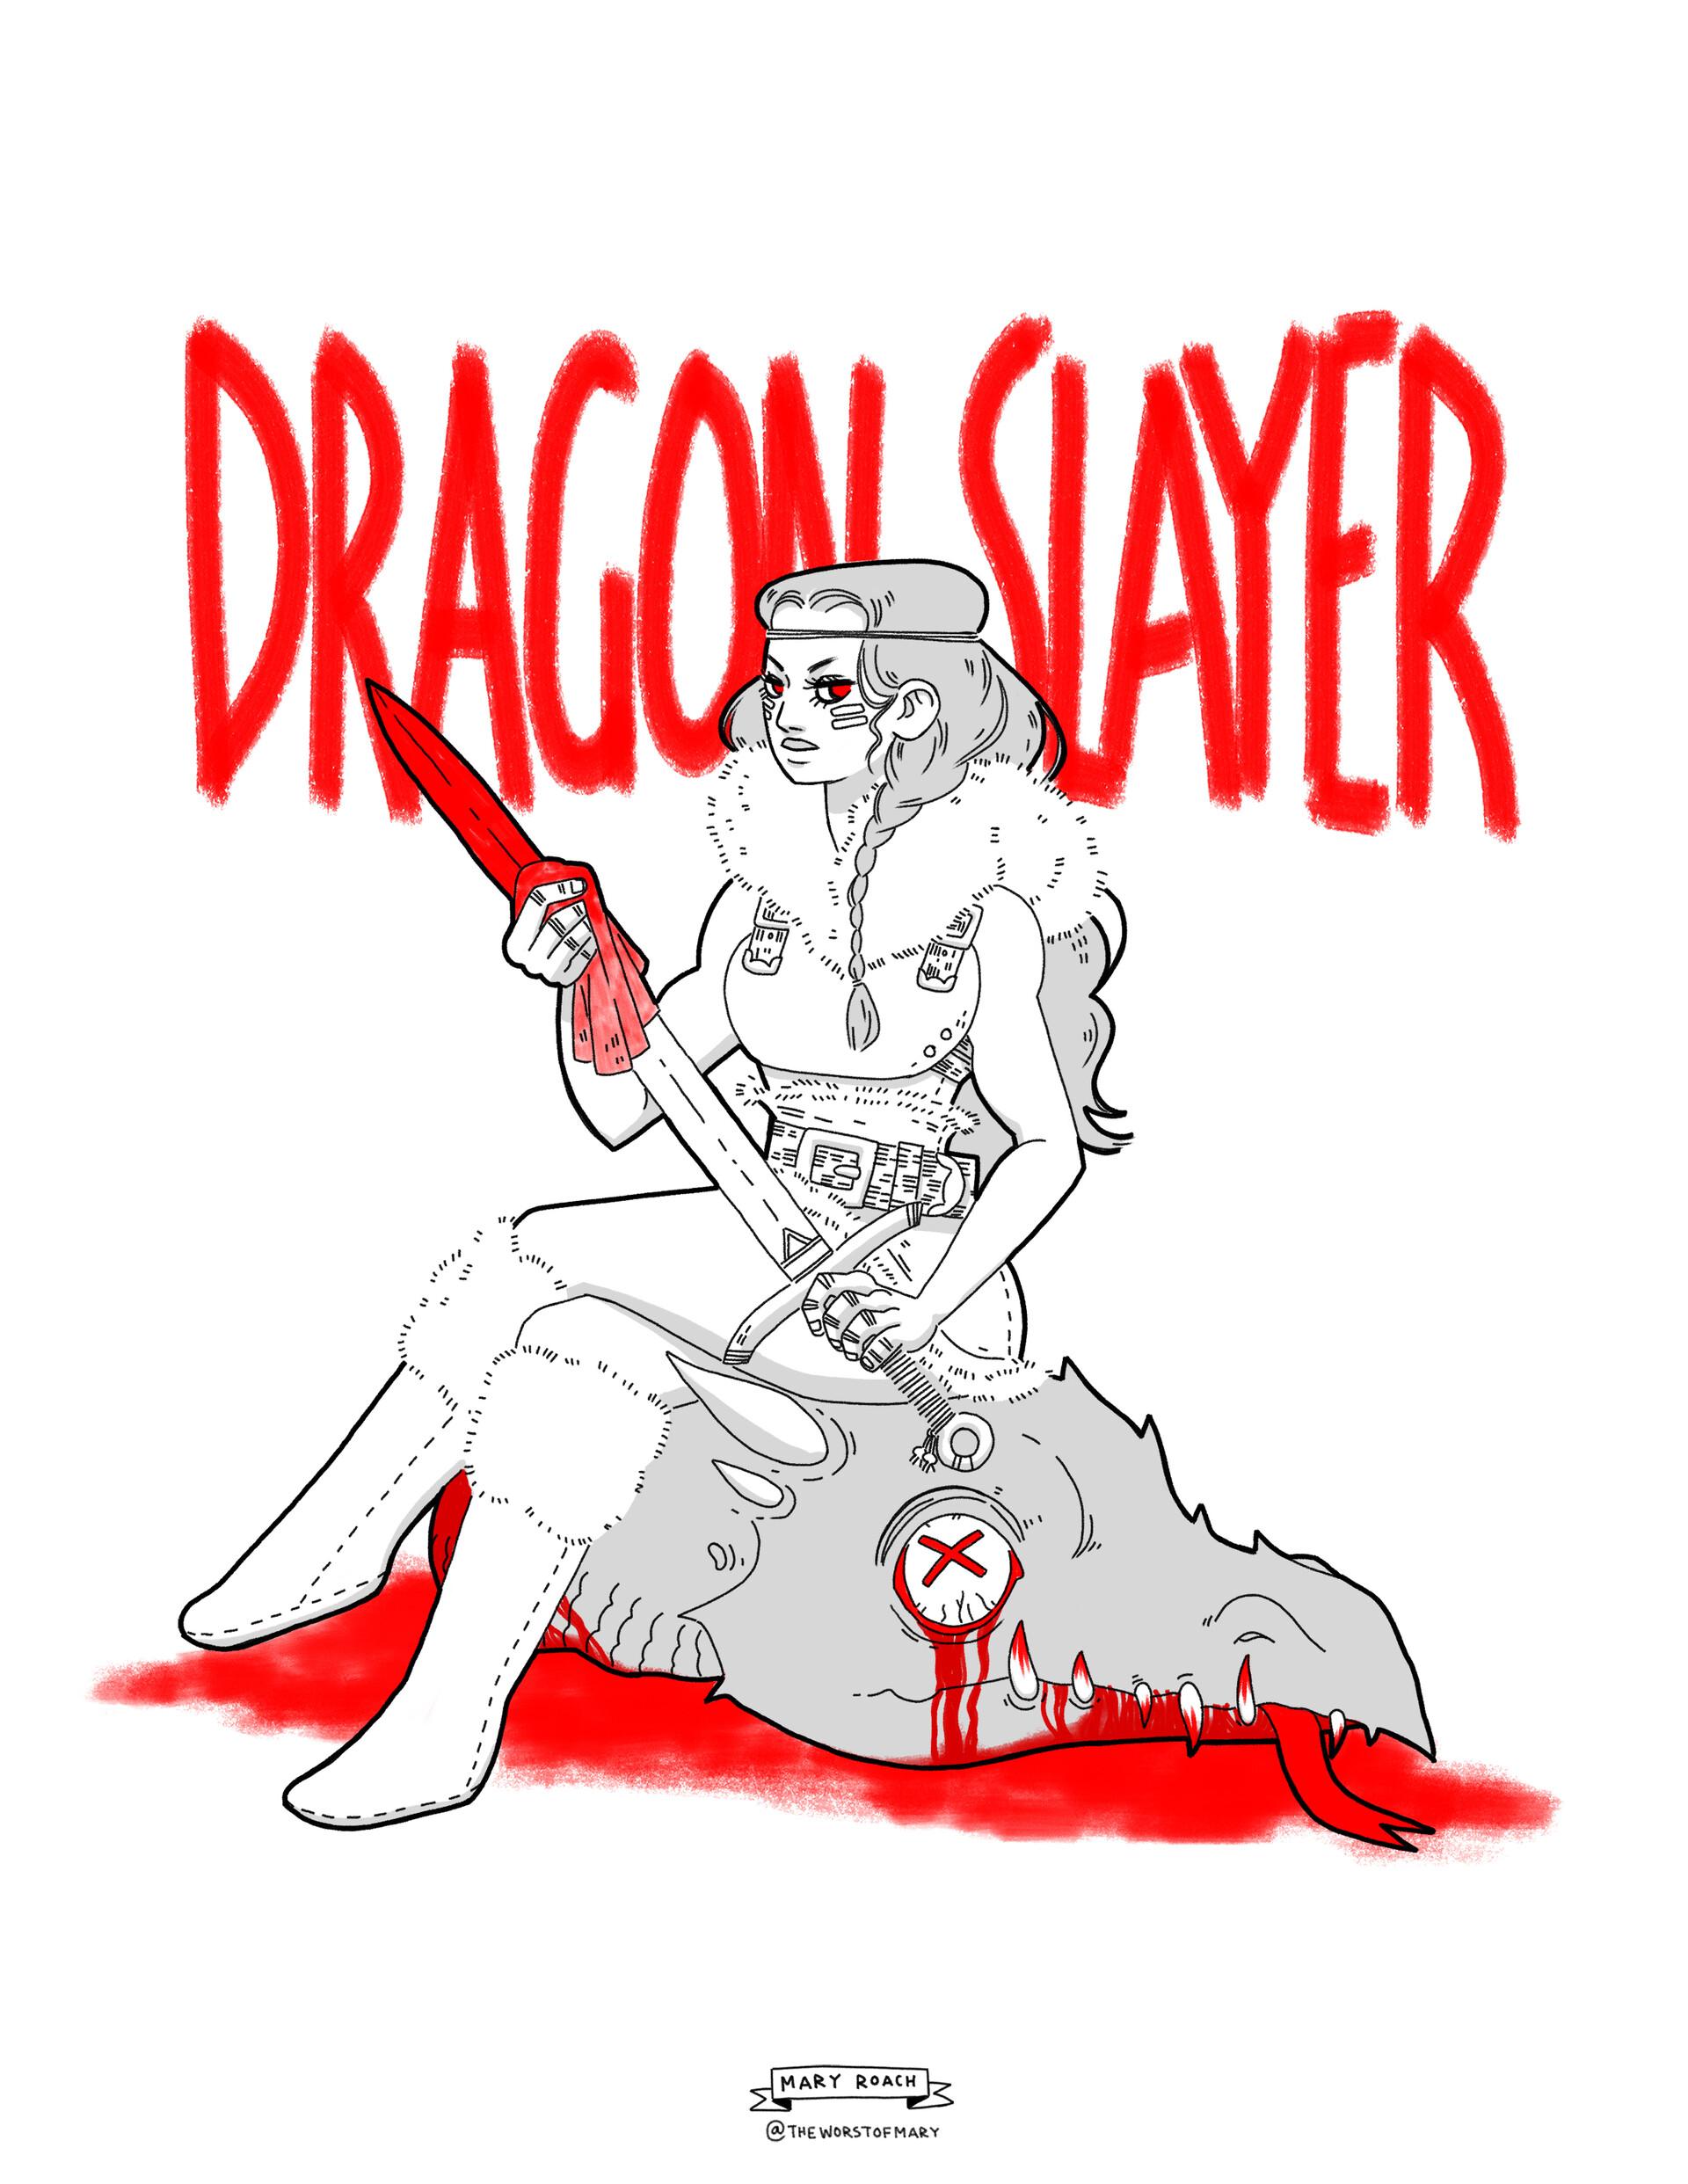 Mary roach dragonslayer1